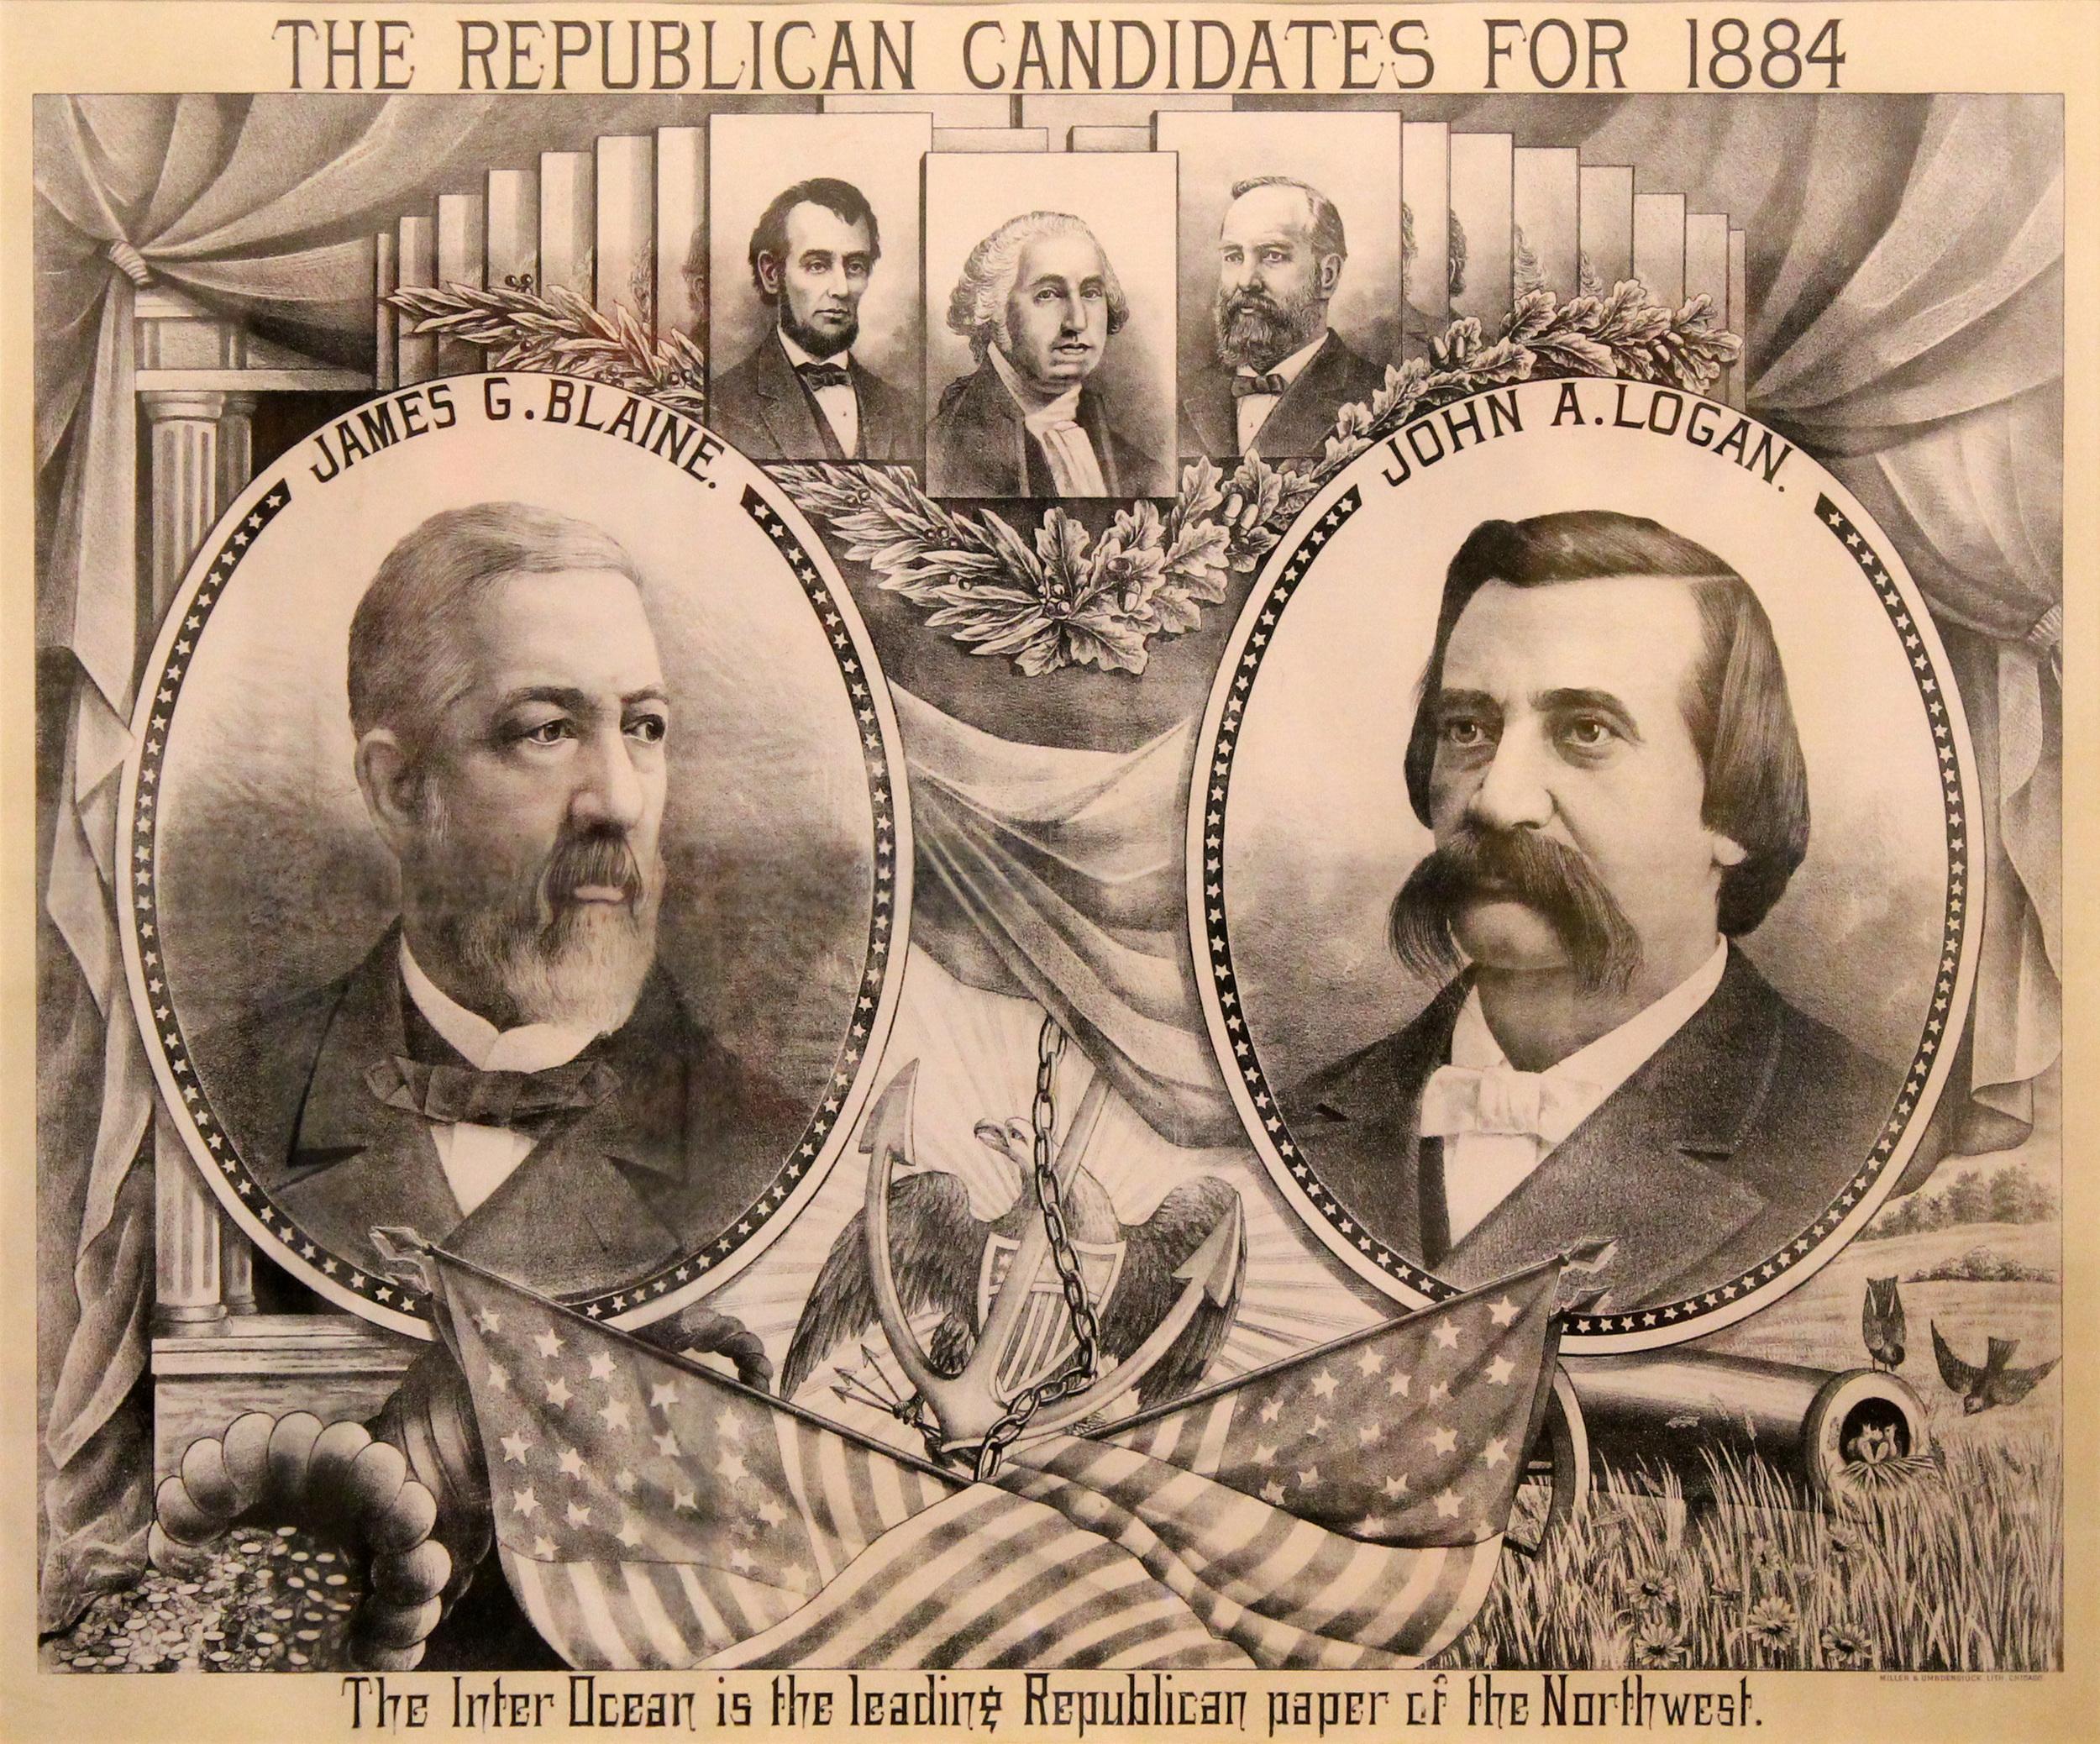 Blaine and Logan, Republican Candidates 1884, HIGH RES.jpg